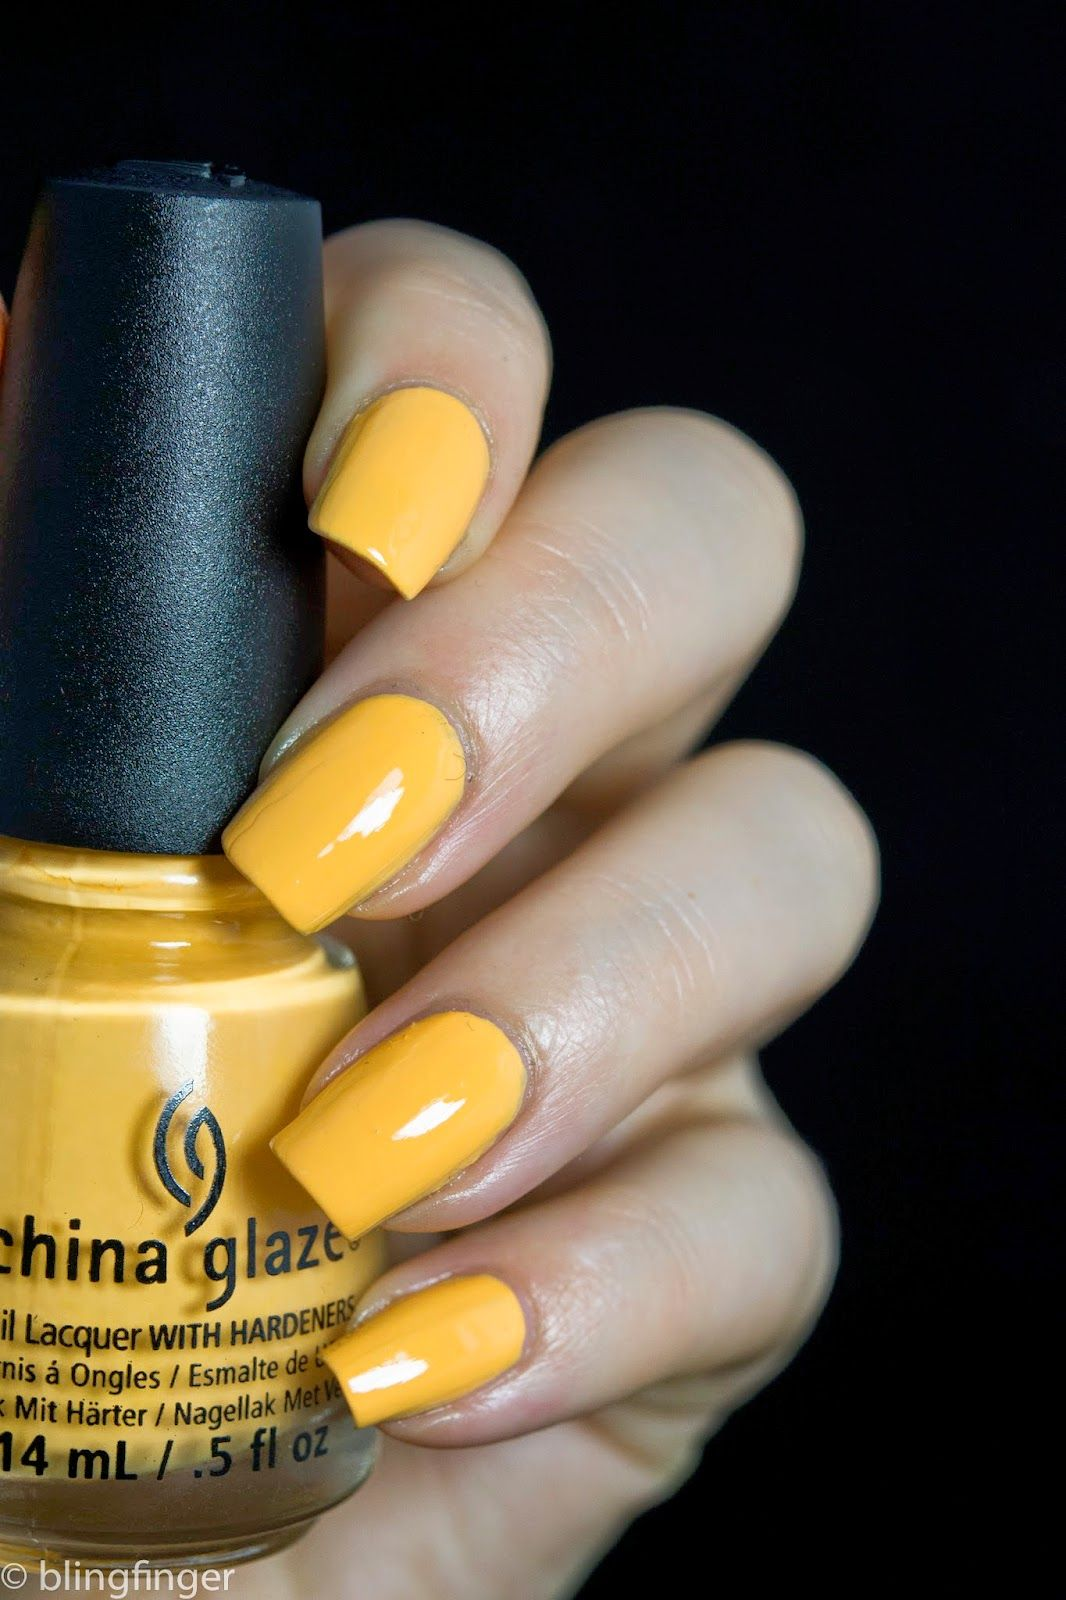 China Glaze Metro Pollen Tin Swatches And Review Http Www Blingfinger Net 2014 04 China Glaze Metro Pollen Tin S Beautiful Nail Designs Nails Nail Polish